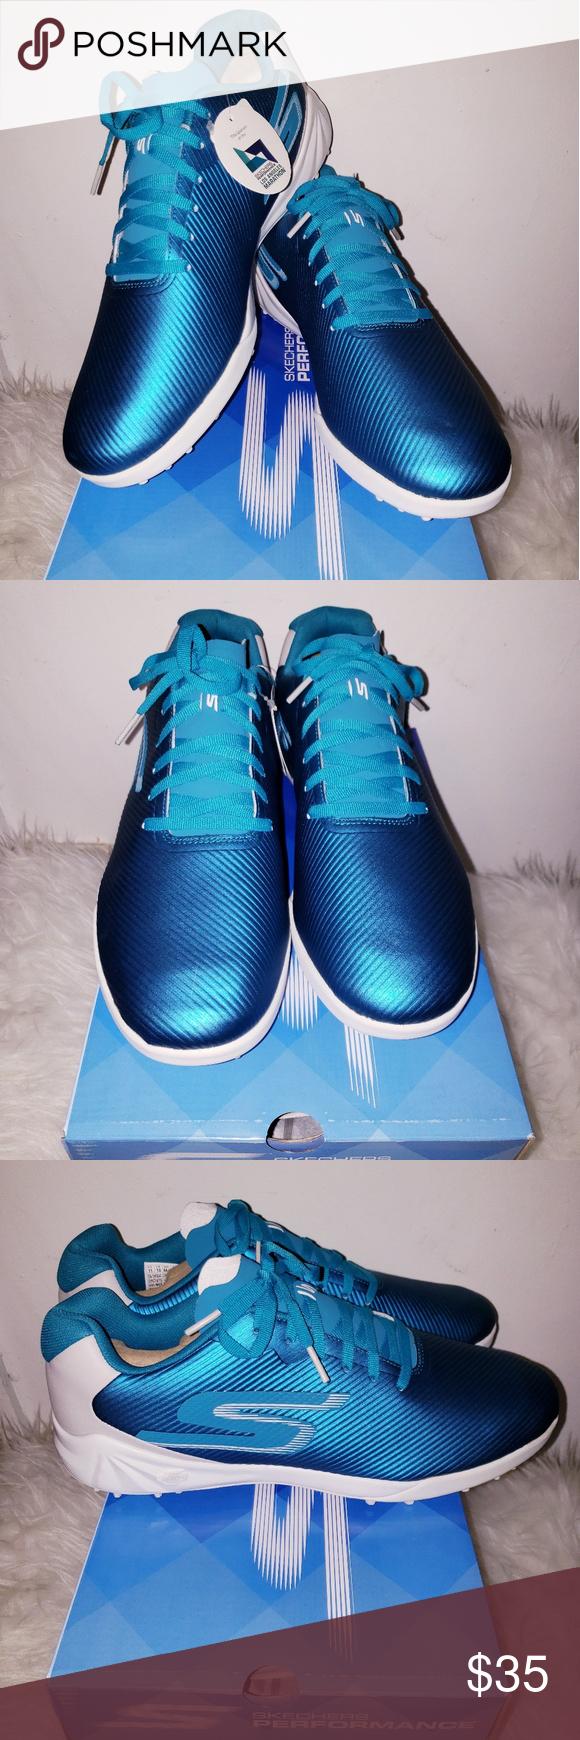 5b5fd804e8f Skechers Mens Hexgo Control Turf Soccer Shoe Brand new in box Skechers  Performance Mens Hexgo Control